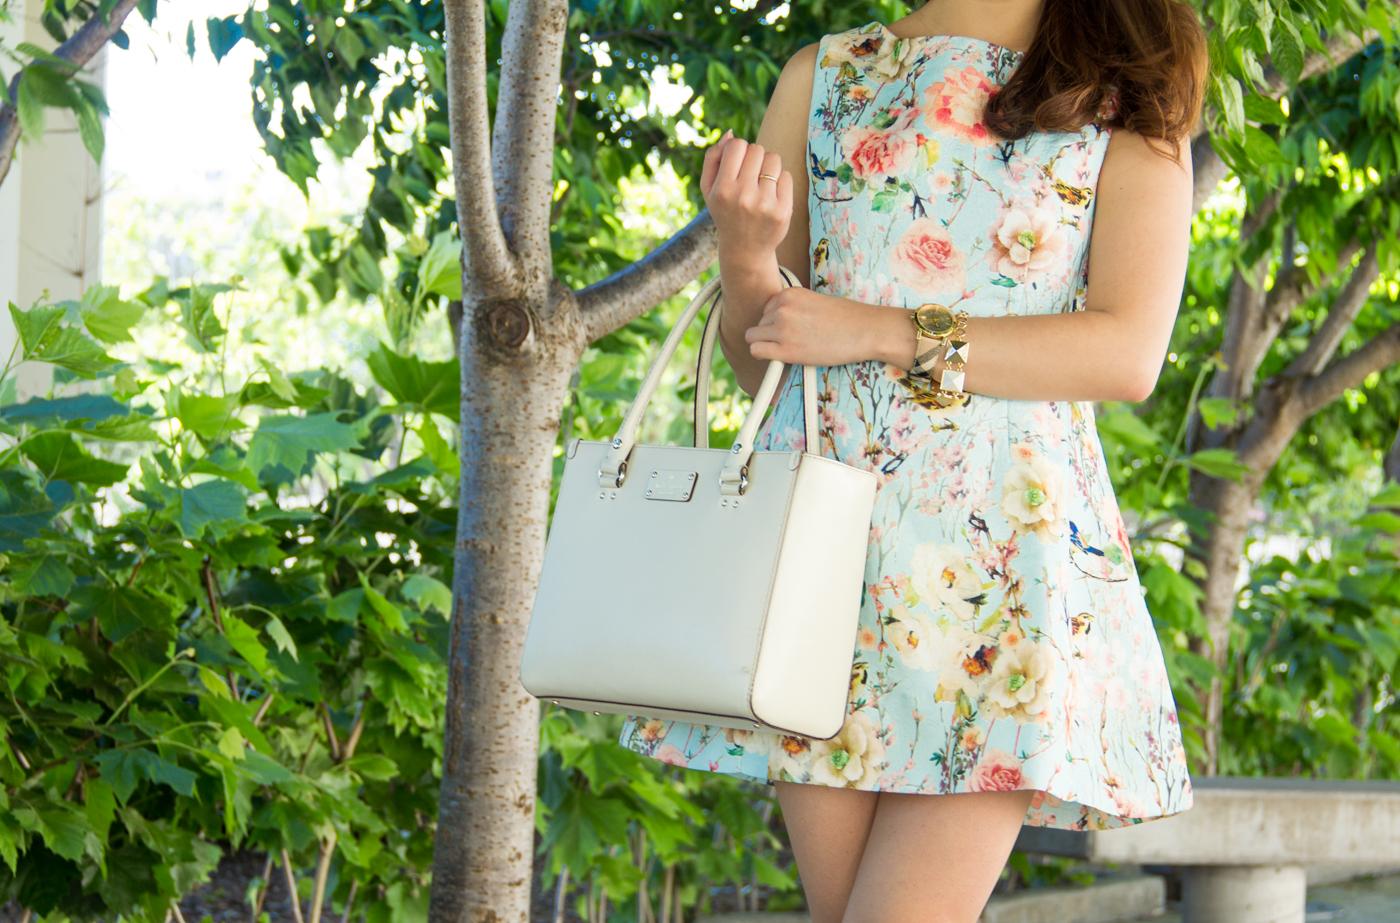 Floral a-line jacquard dress | via The Chic Diary